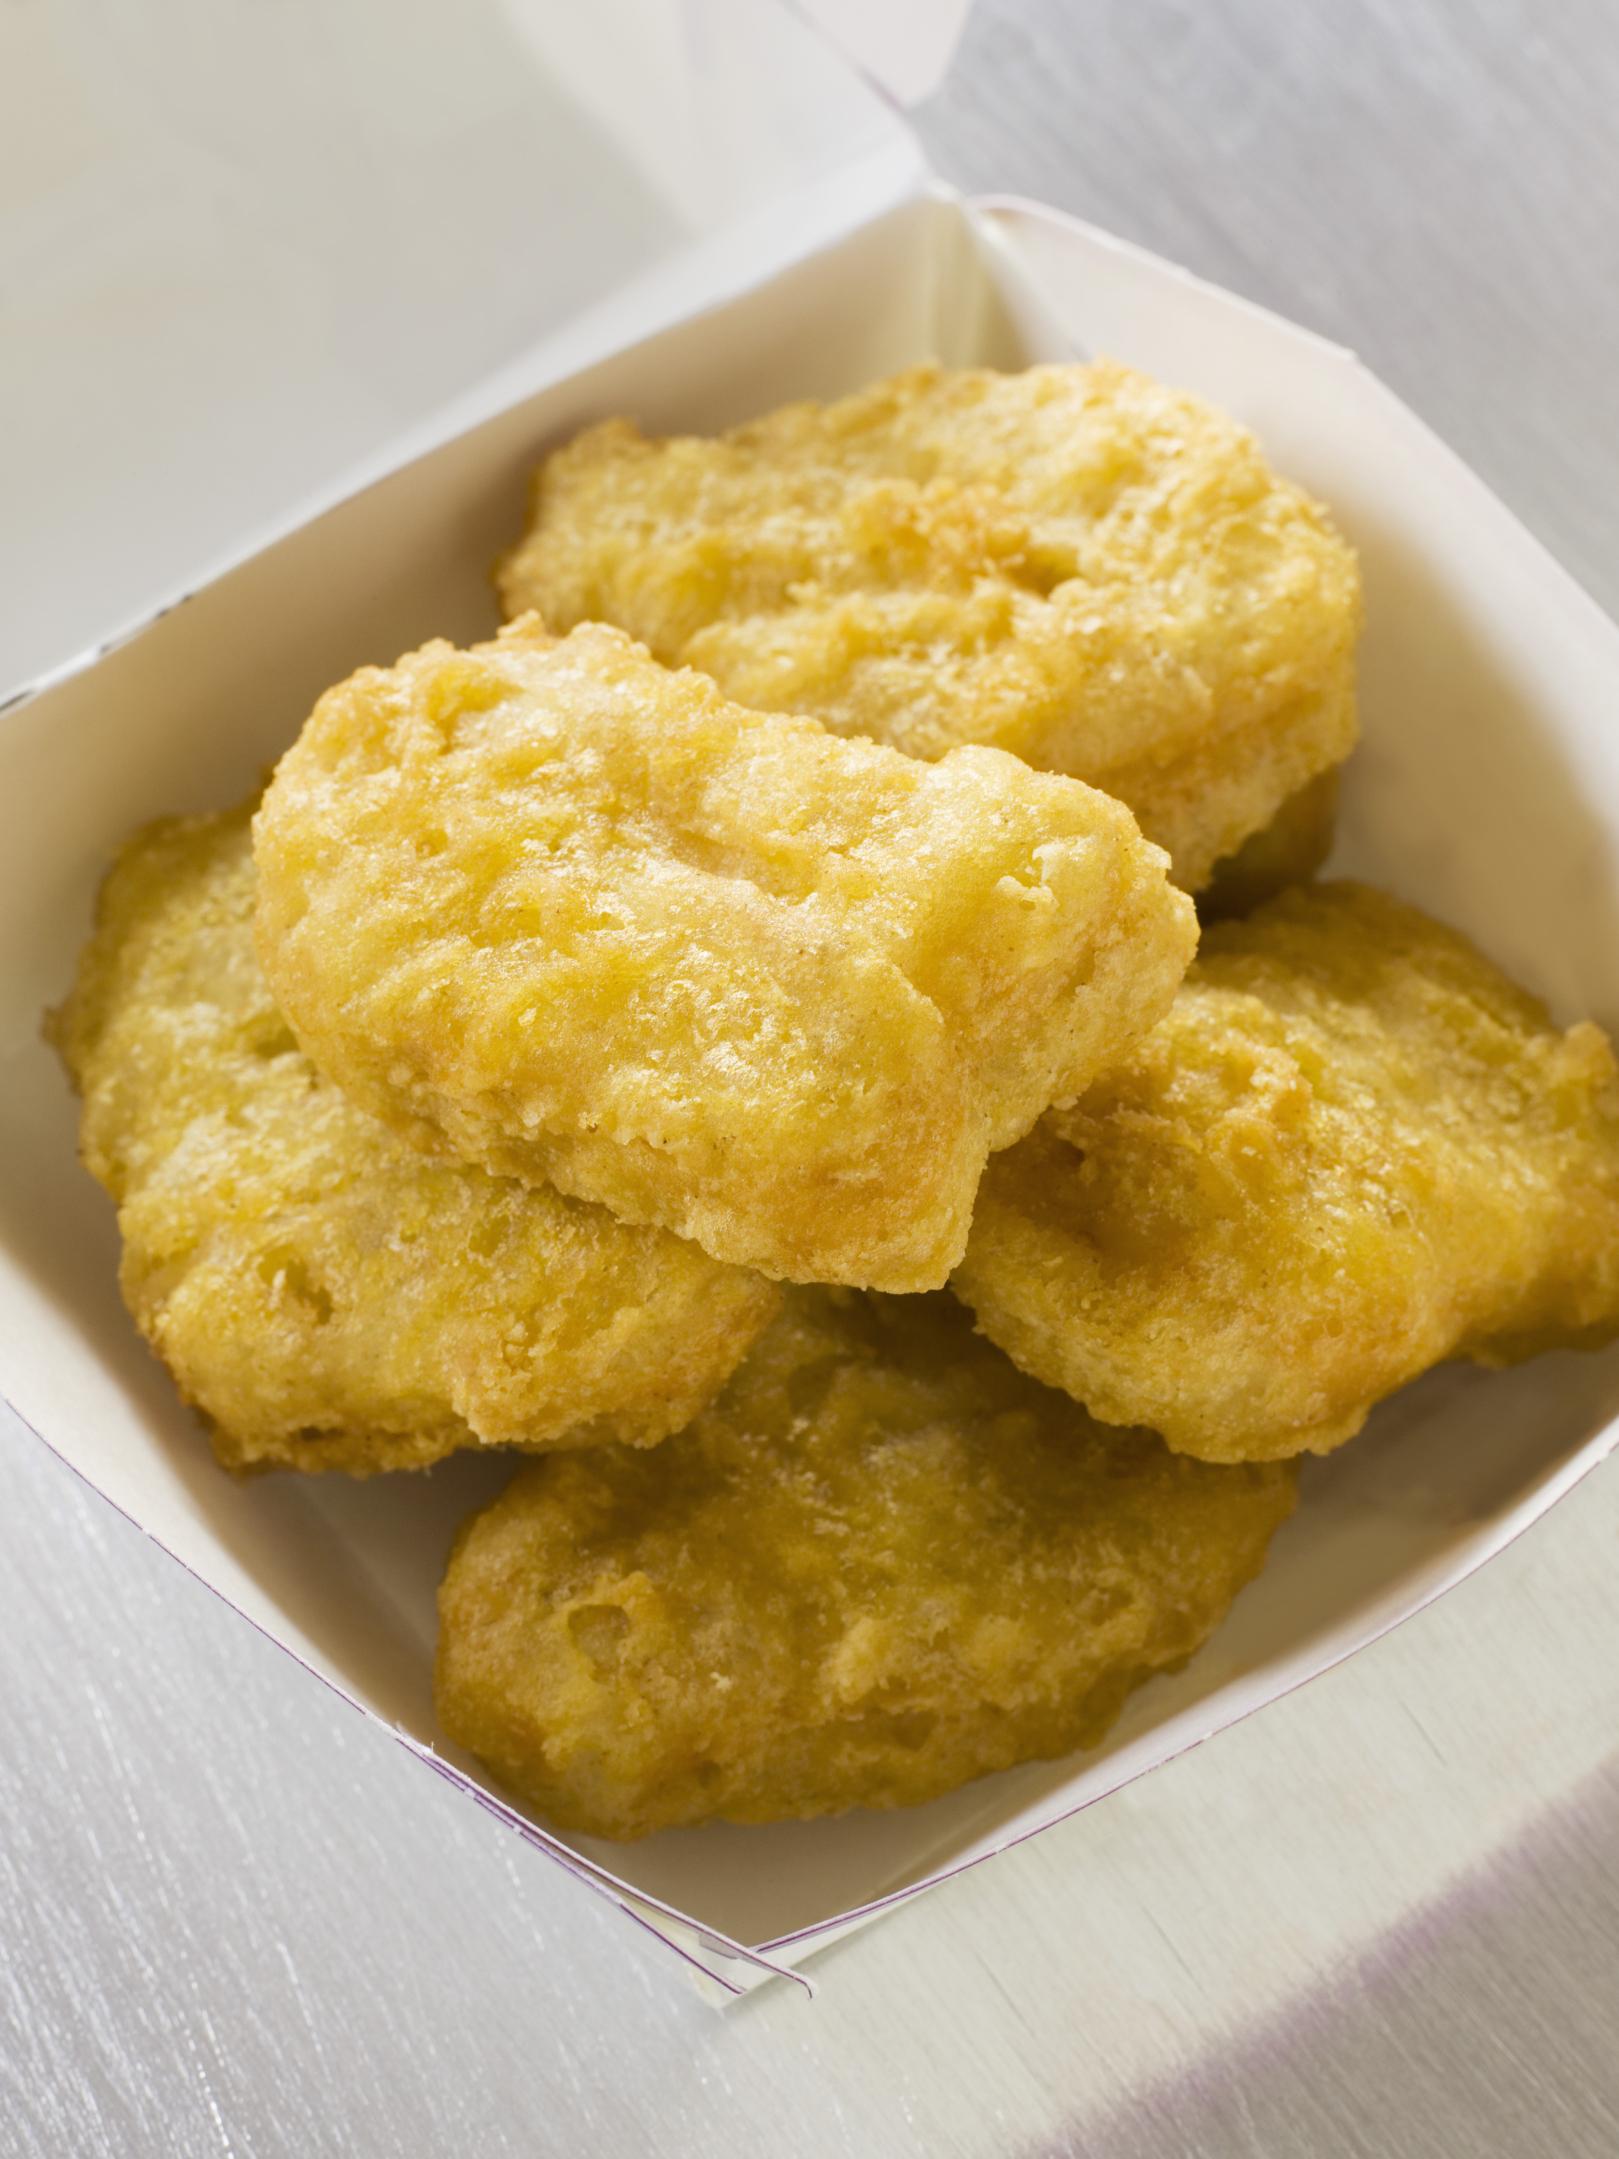 Calories In Mcdonald's 10 Piece Chicken Nuggets : calories, mcdonald's, piece, chicken, nuggets, Calories, McDonald's, Chicken, Nuggets